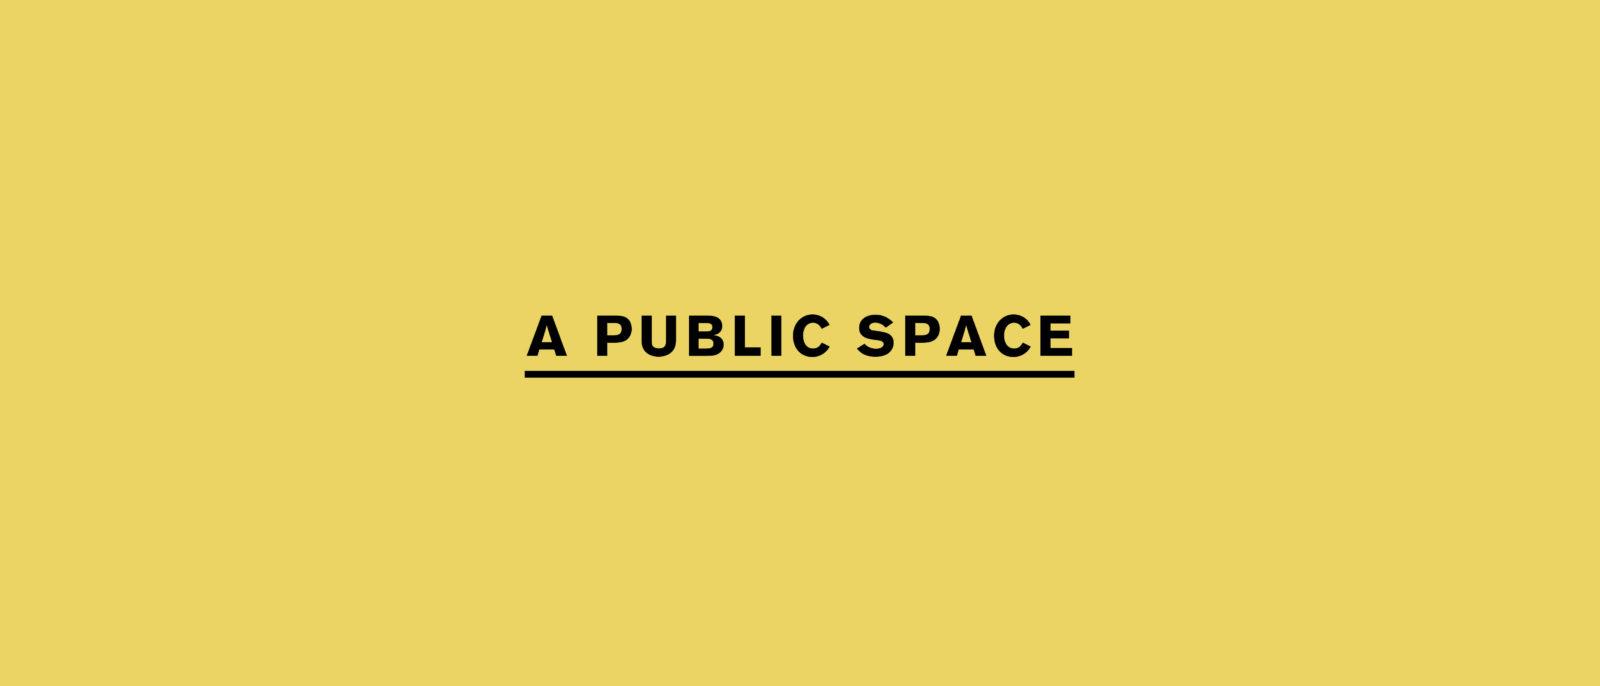 A Public Space, The Center for Fiction